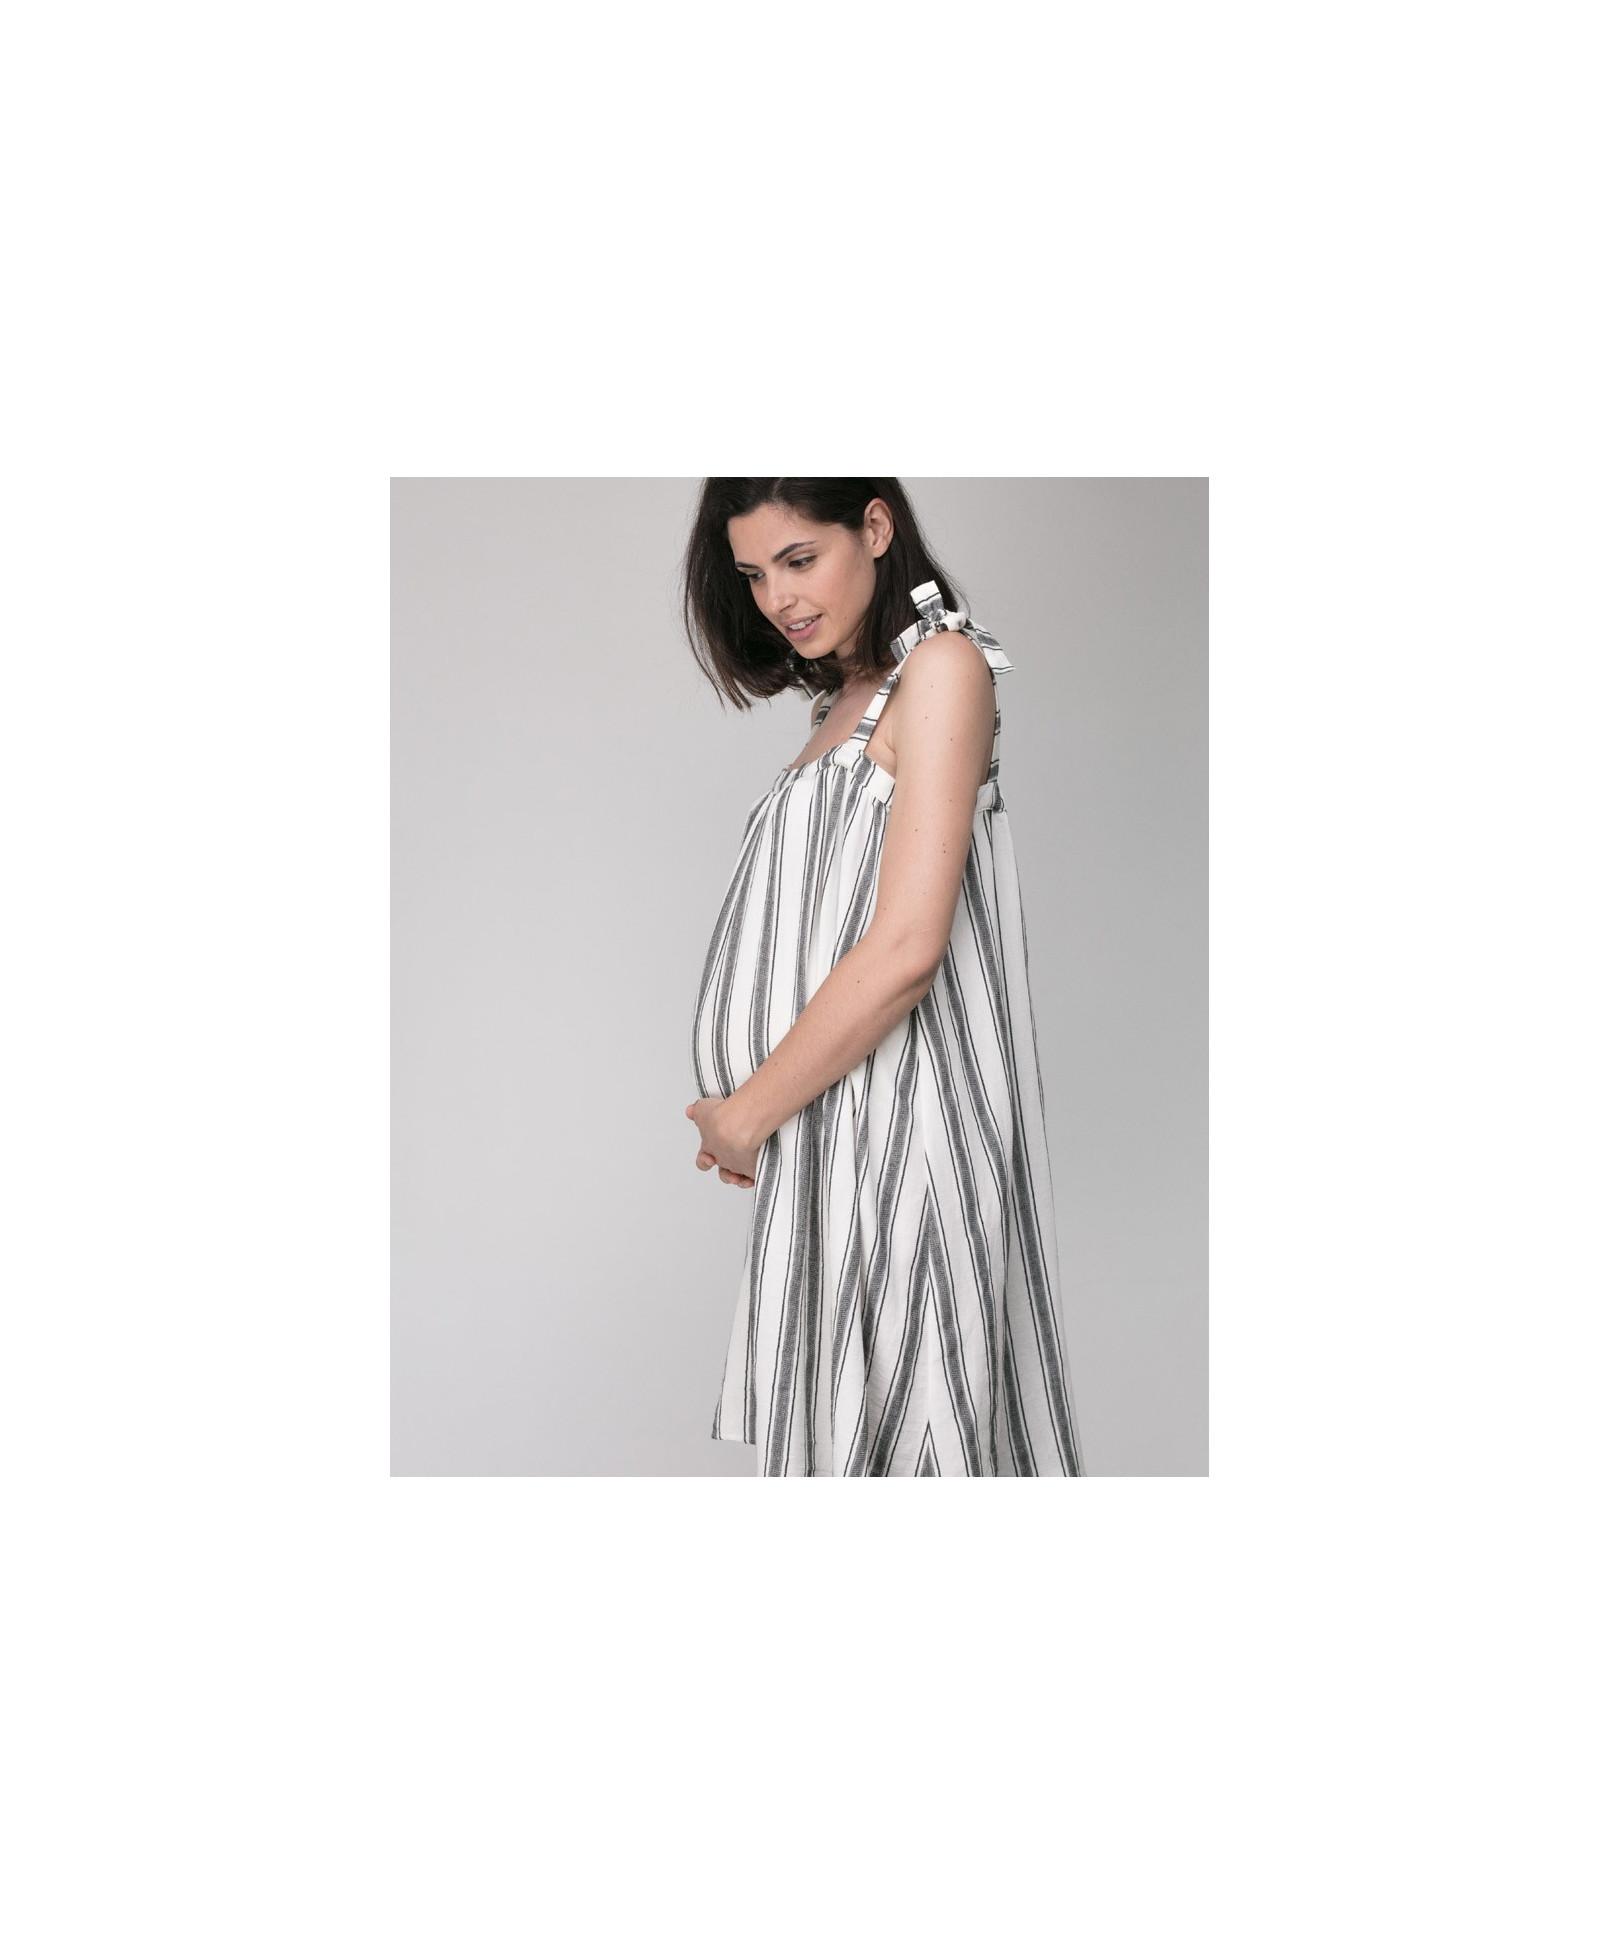 695664c24d78c Elegant dress Jospephine l during & after pregnancy | Joli Bump